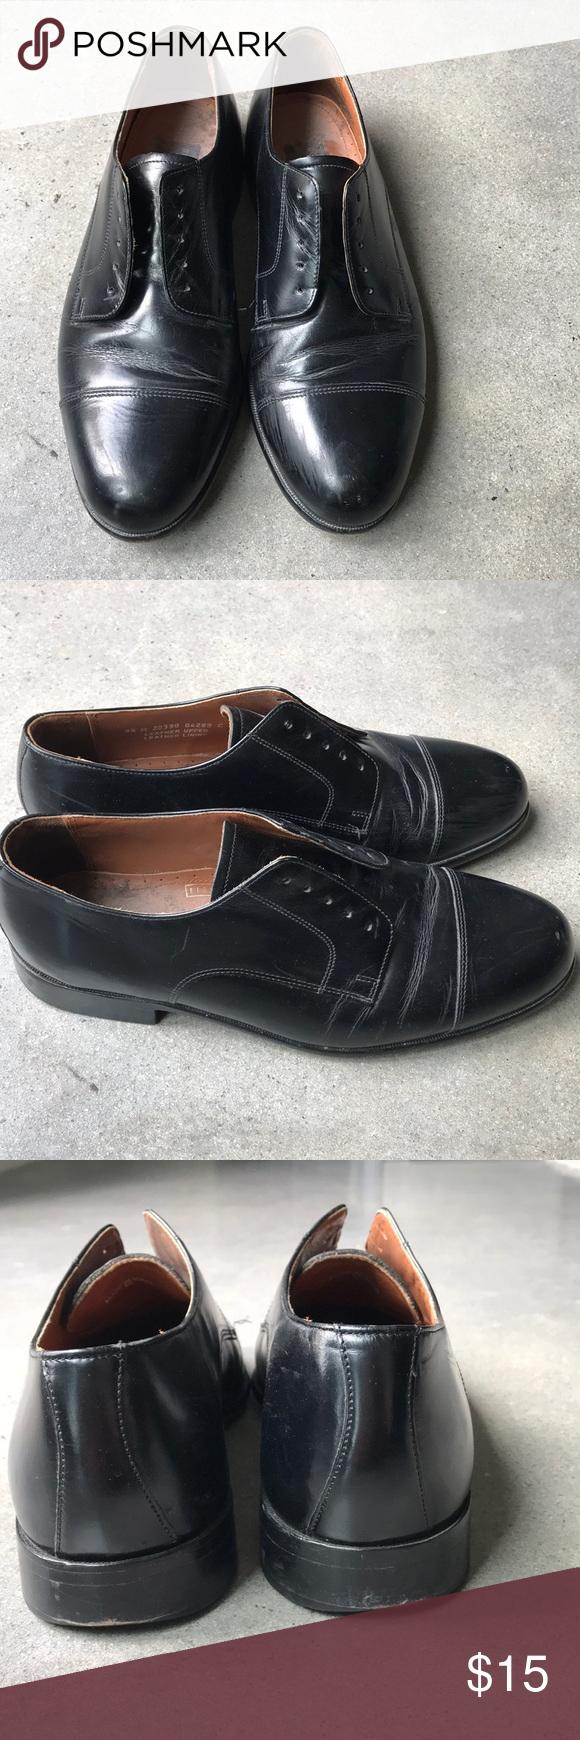 Bostonian Classic Dress Shoes Black Dress Shoes No Shoe Laces Bostonian Shoes Dress Shoes Shoes Bostonian Shoes [ 1740 x 580 Pixel ]